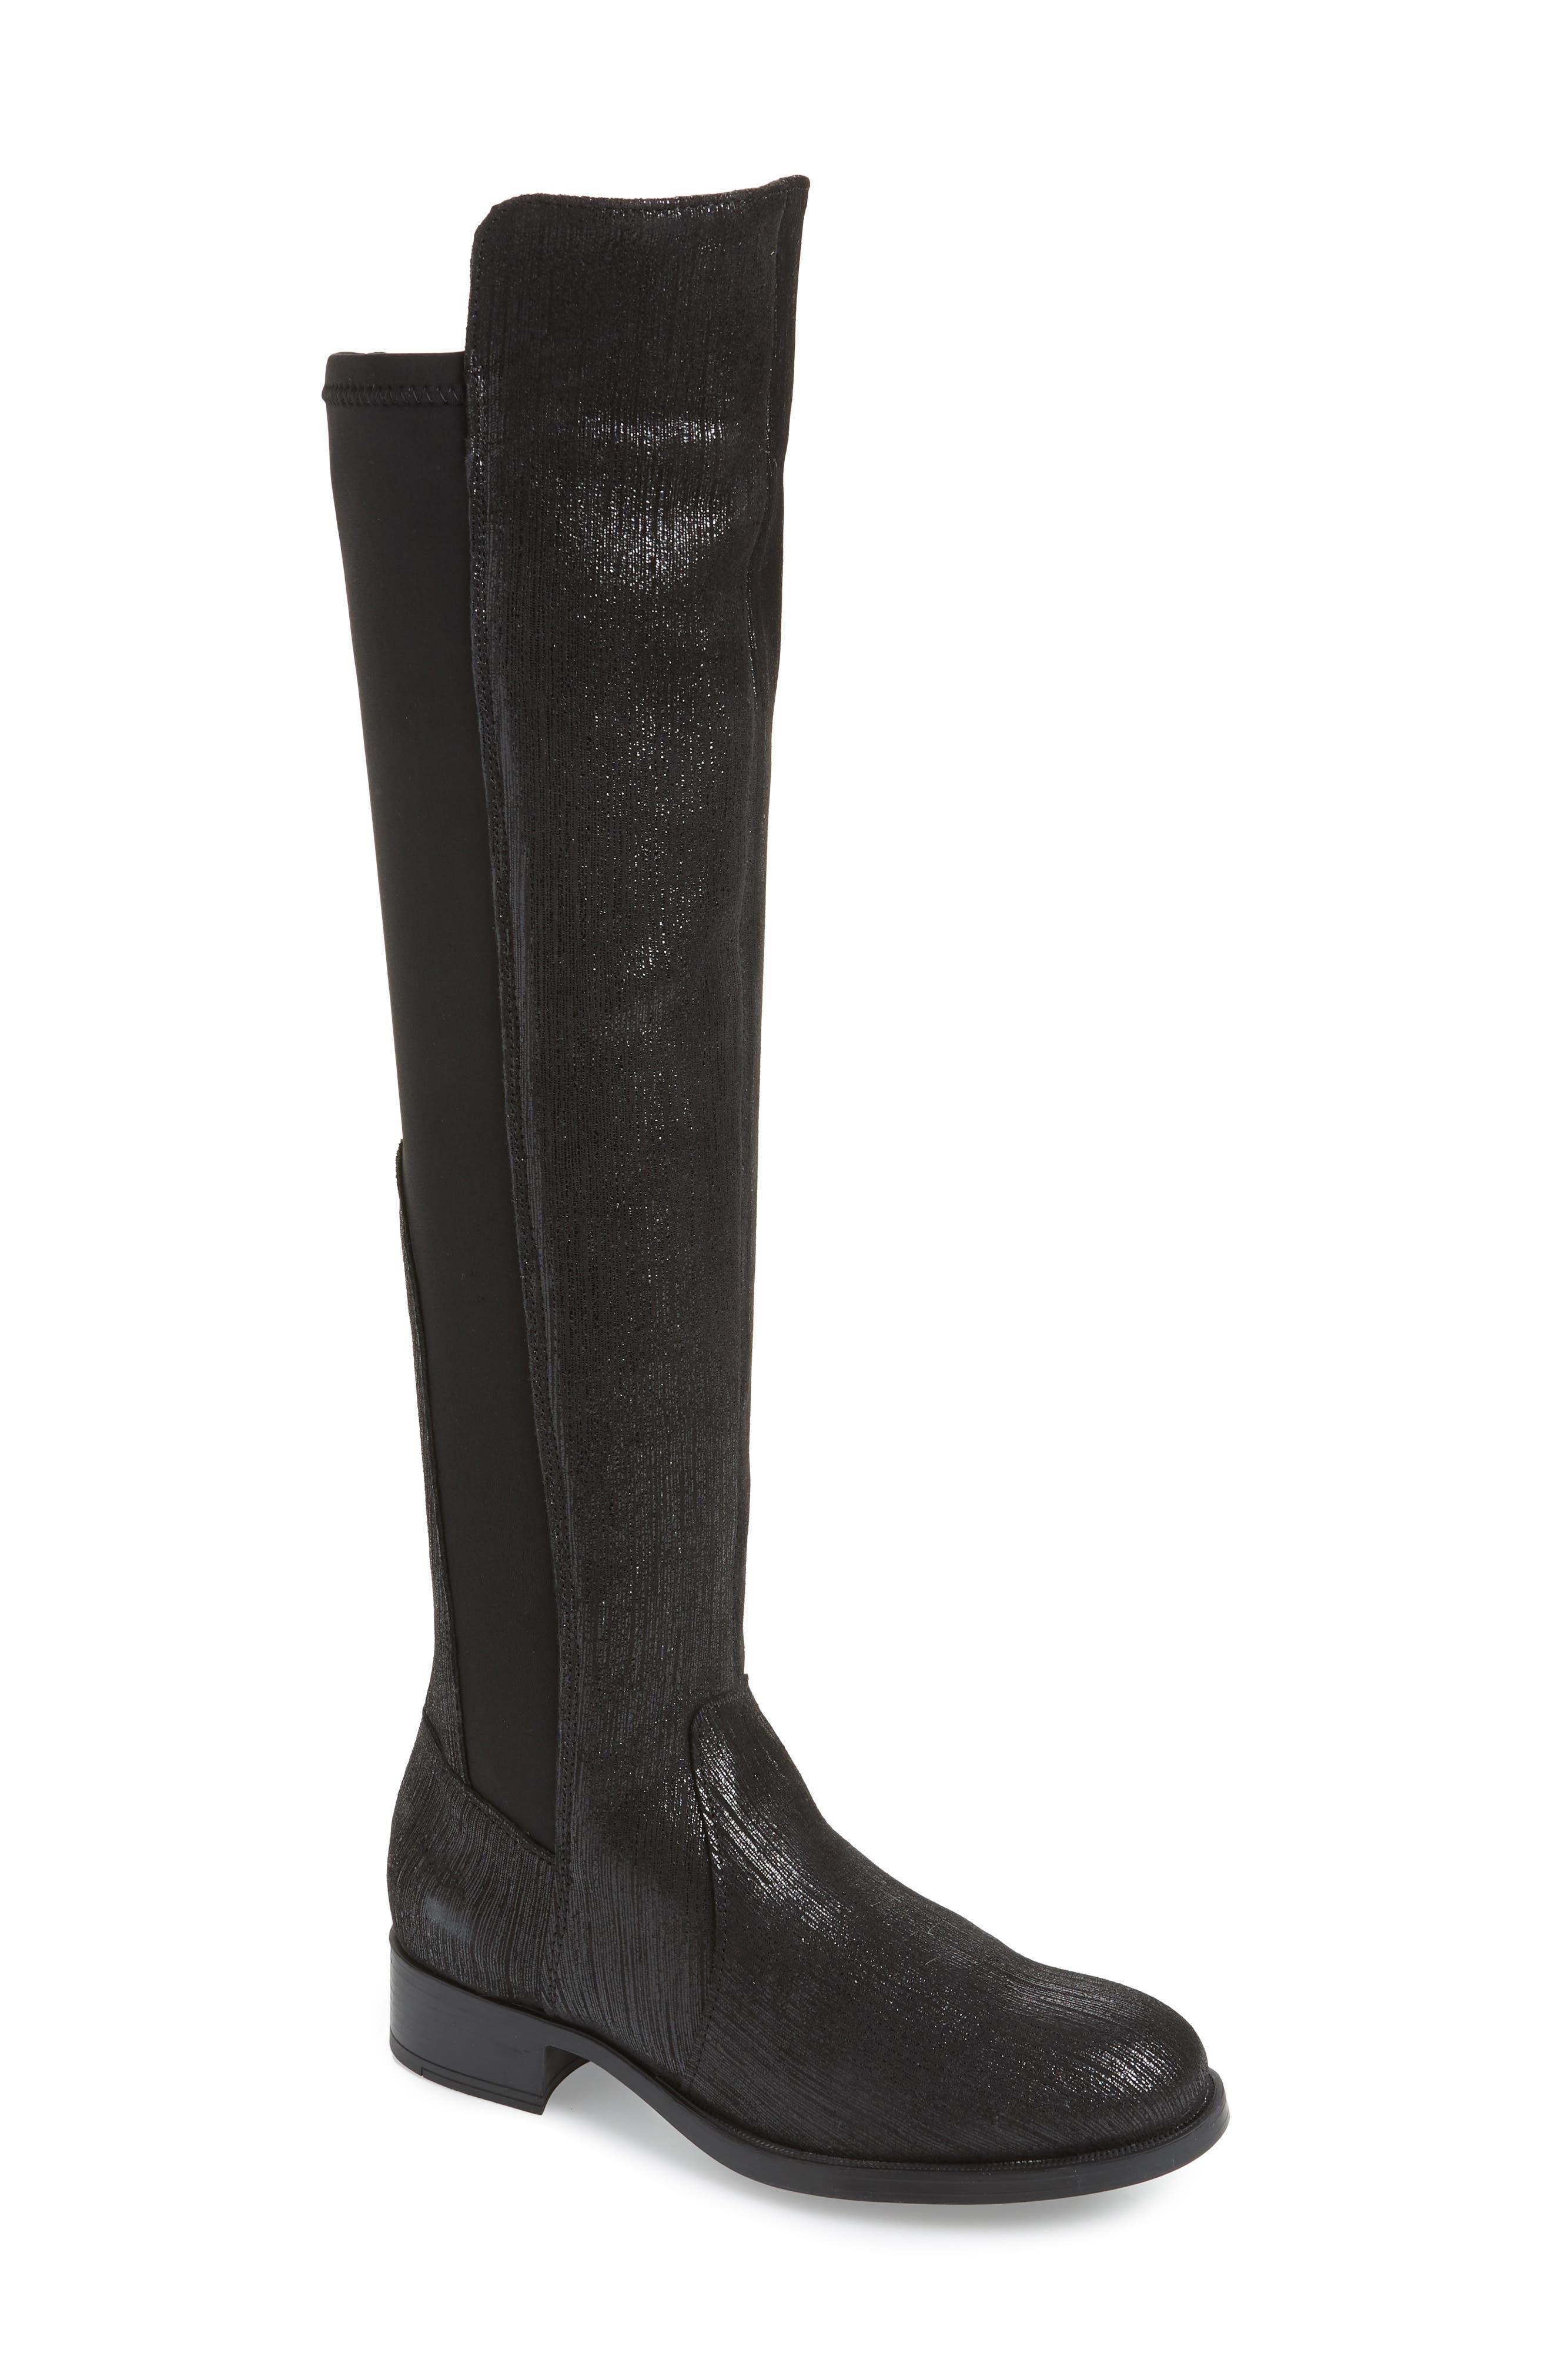 BOS. & CO. Bunt Waterproof Over the Knee Boot, Main, color, BLACK METAL/ LYCRA